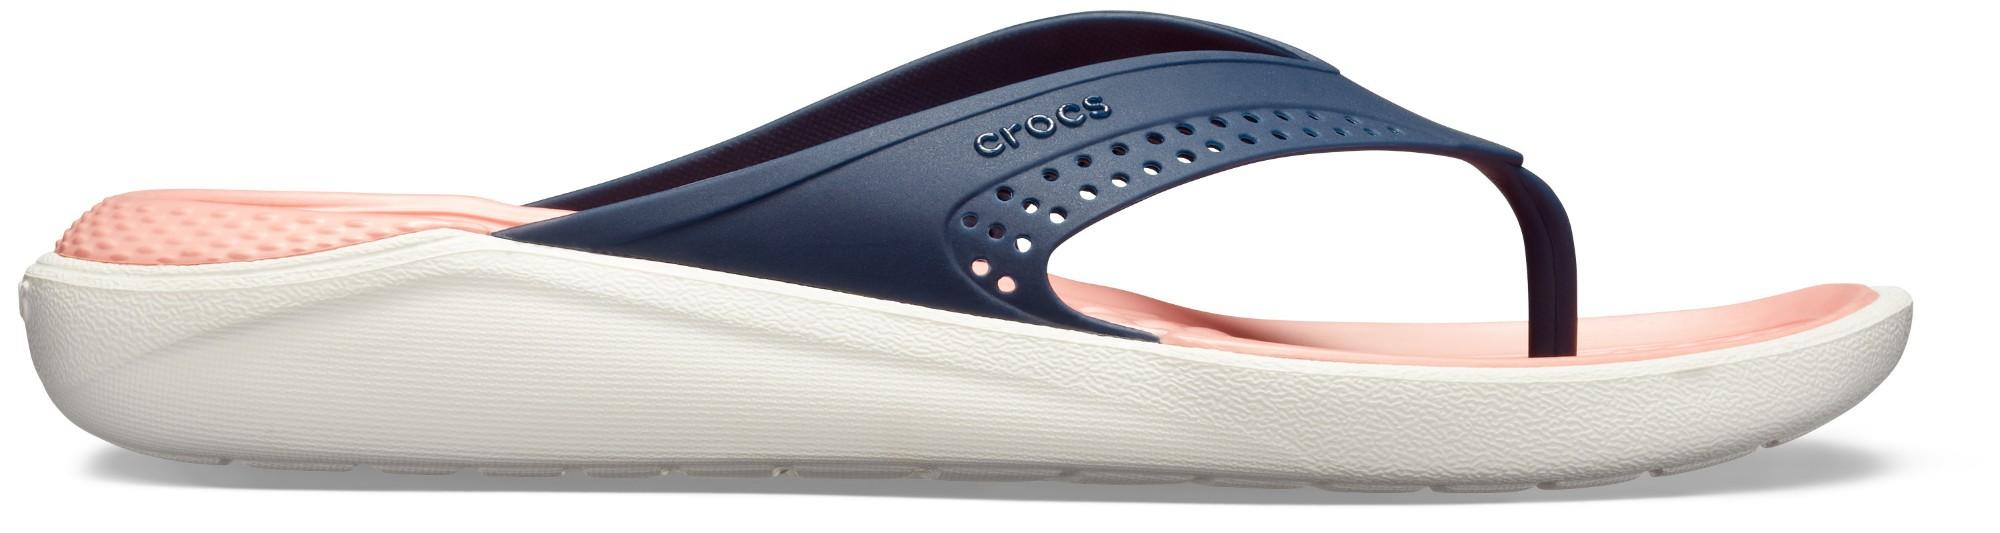 Crocs™ LiteRide Flip Navy/Melon 36,5